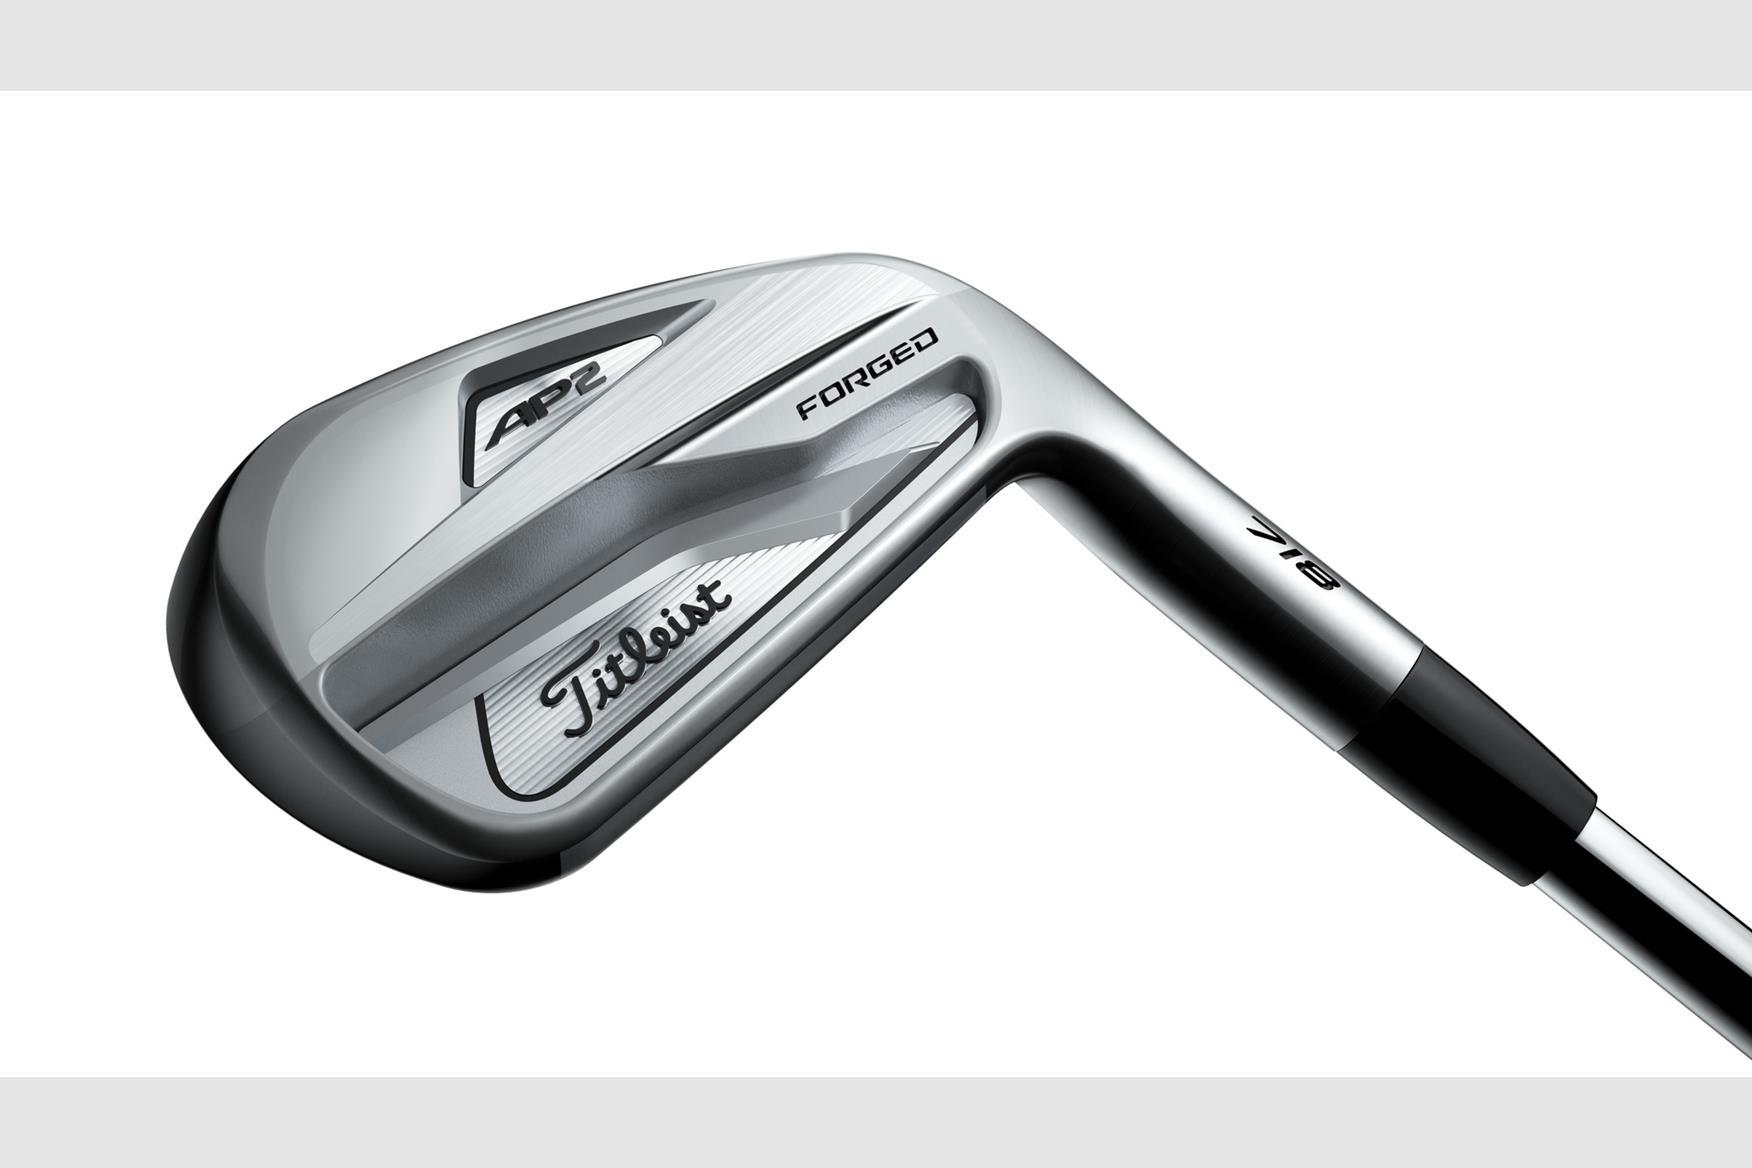 Titleist 718 AP2 Irons Review | Equipment Reviews | Today's Golfer